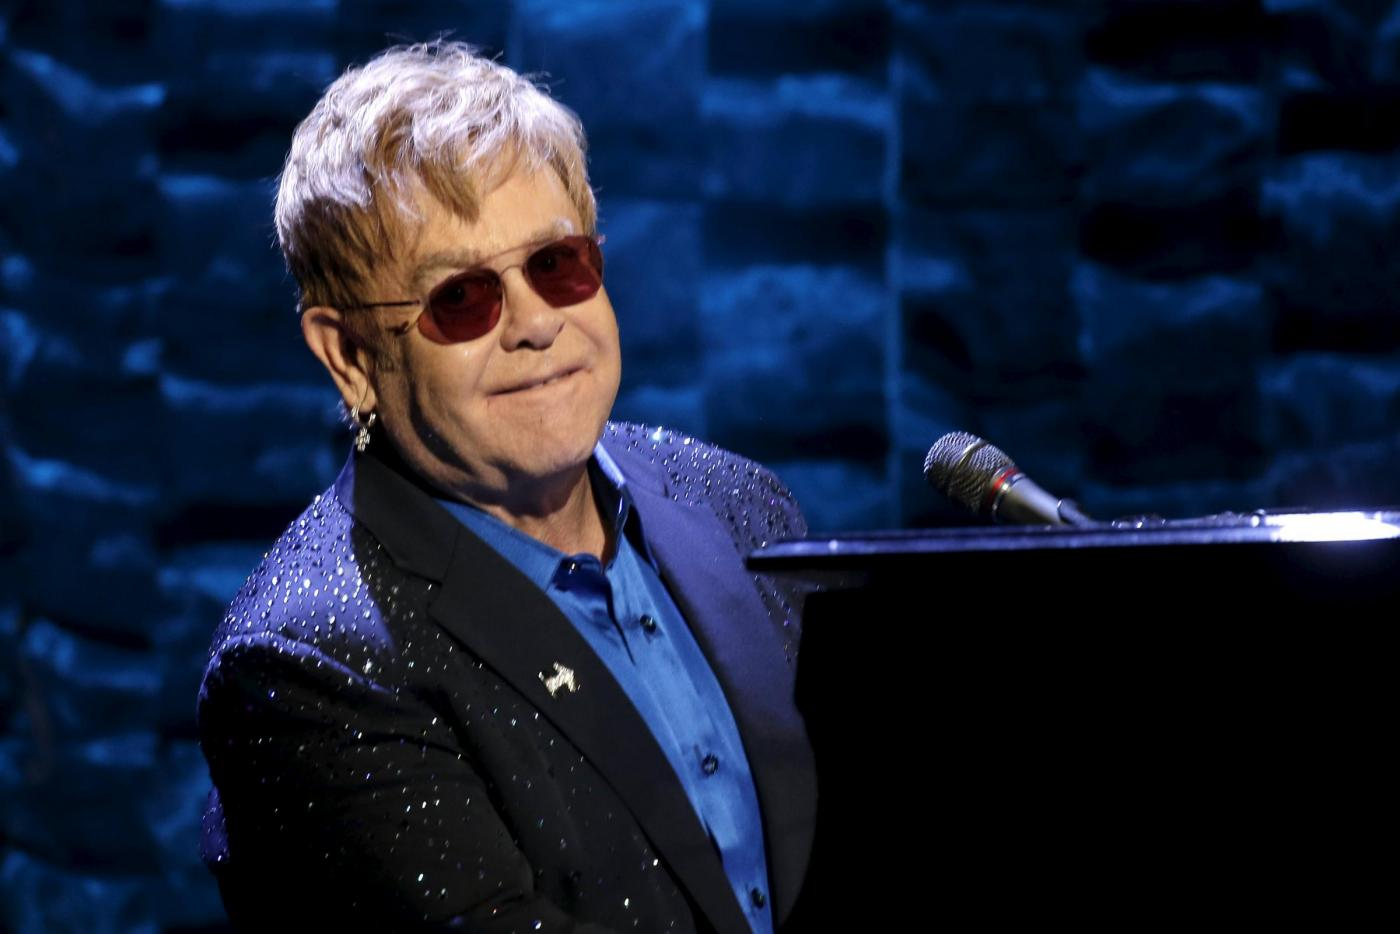 Elton John accusato di molestie